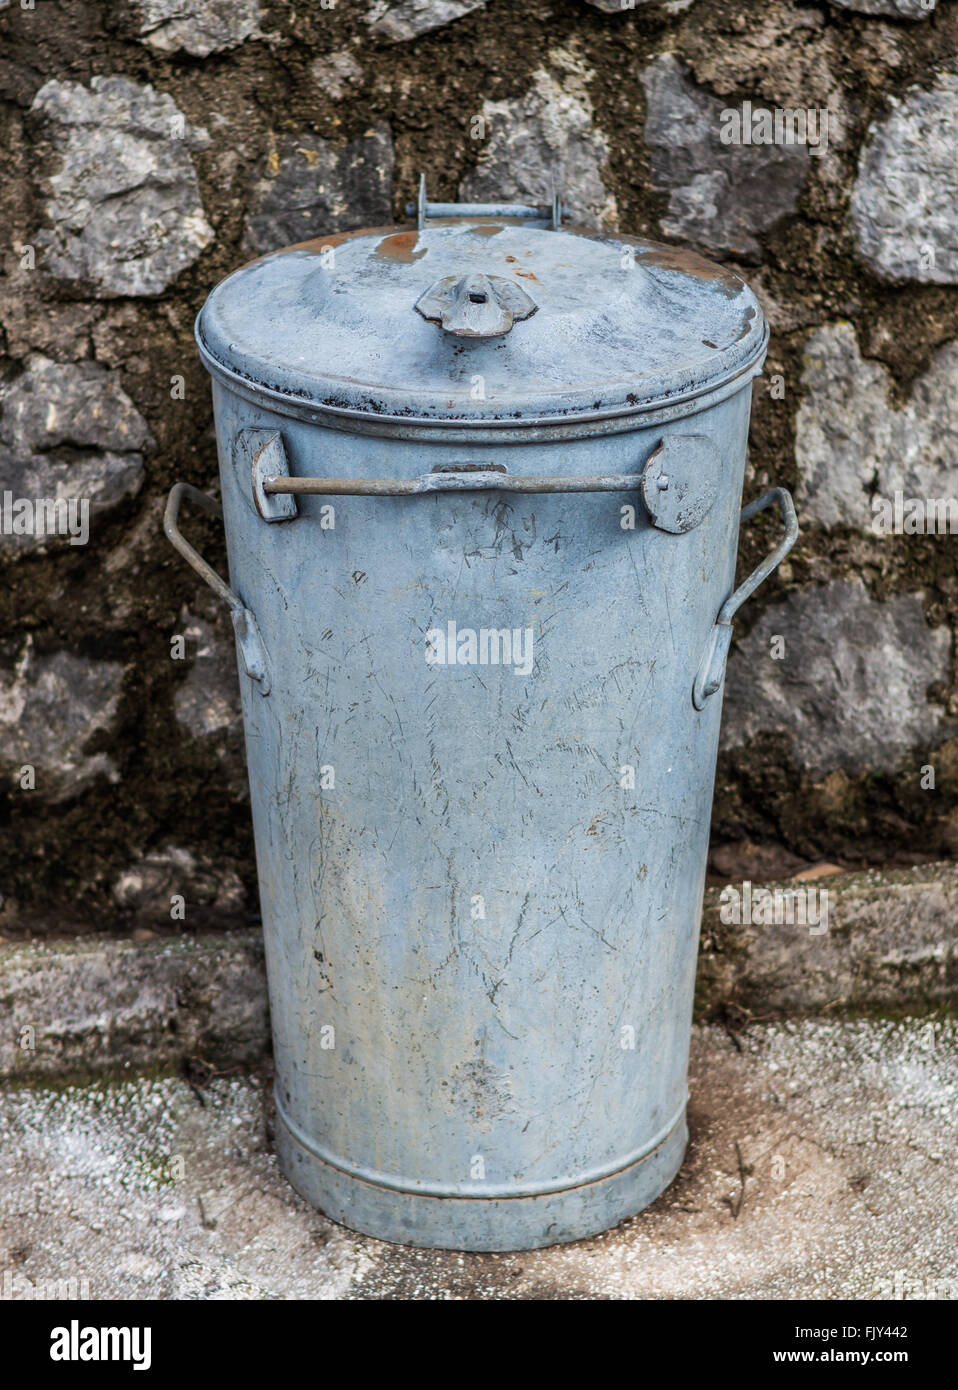 Old rusty metal garbage bin - Stock Image